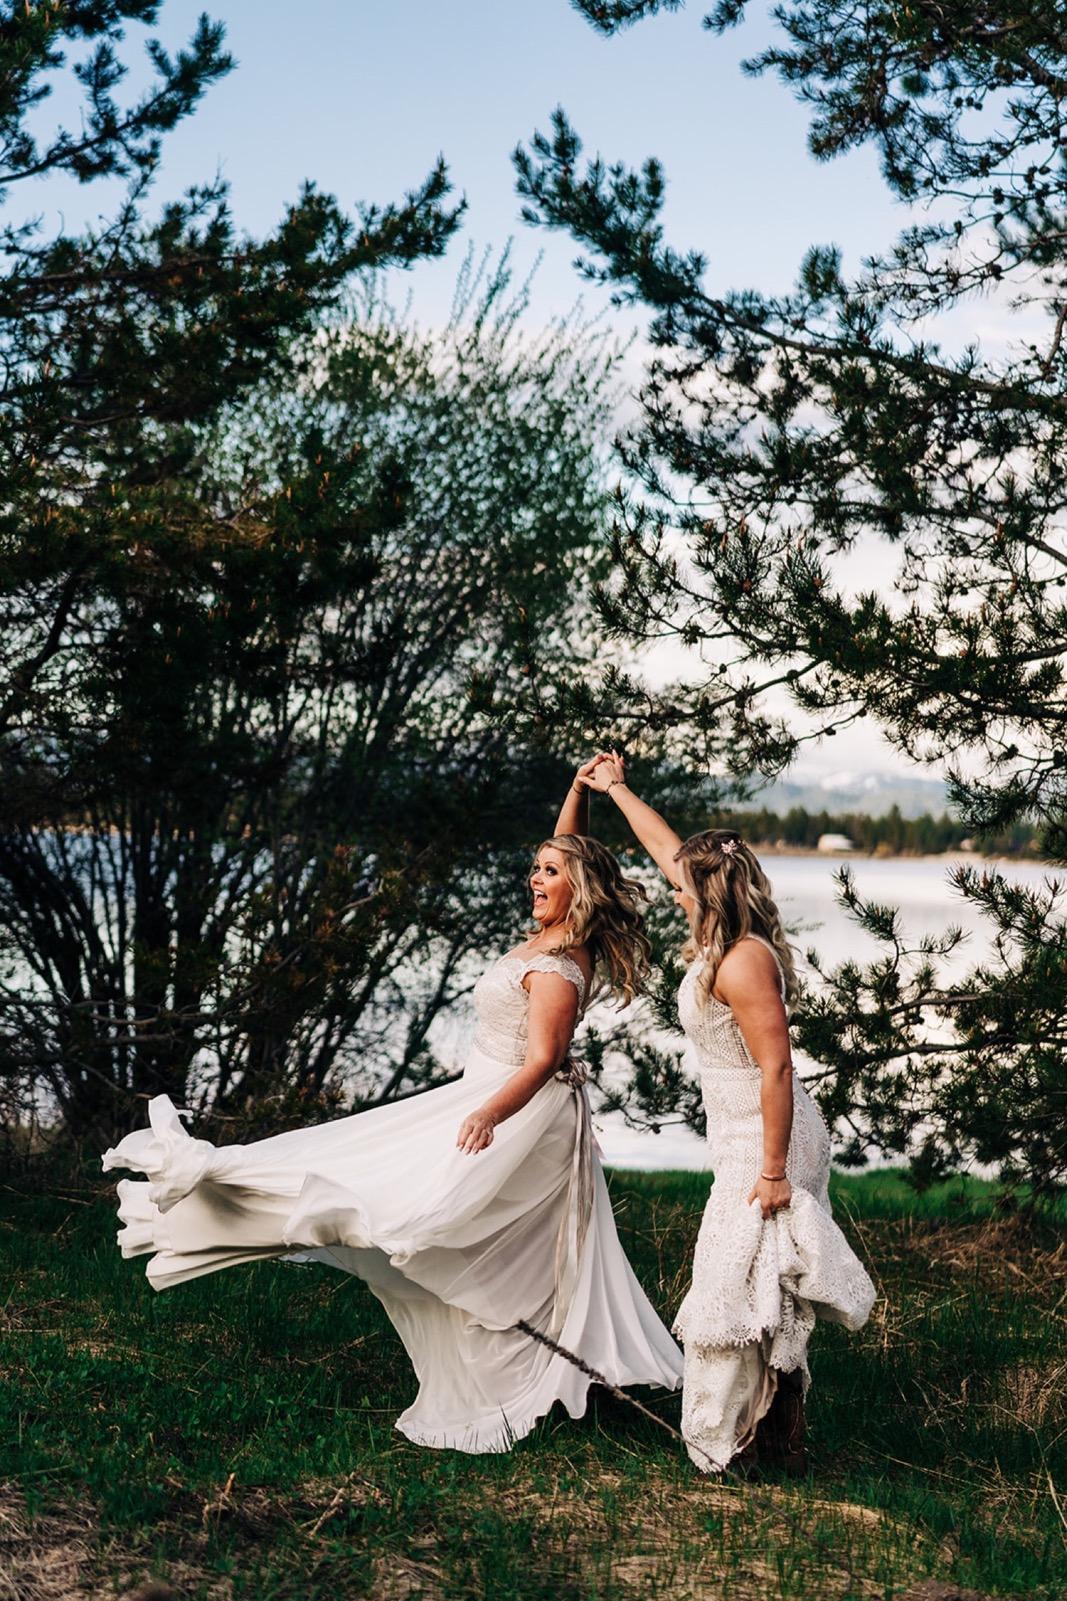 192_falissa_heather_wedding-542.jpg